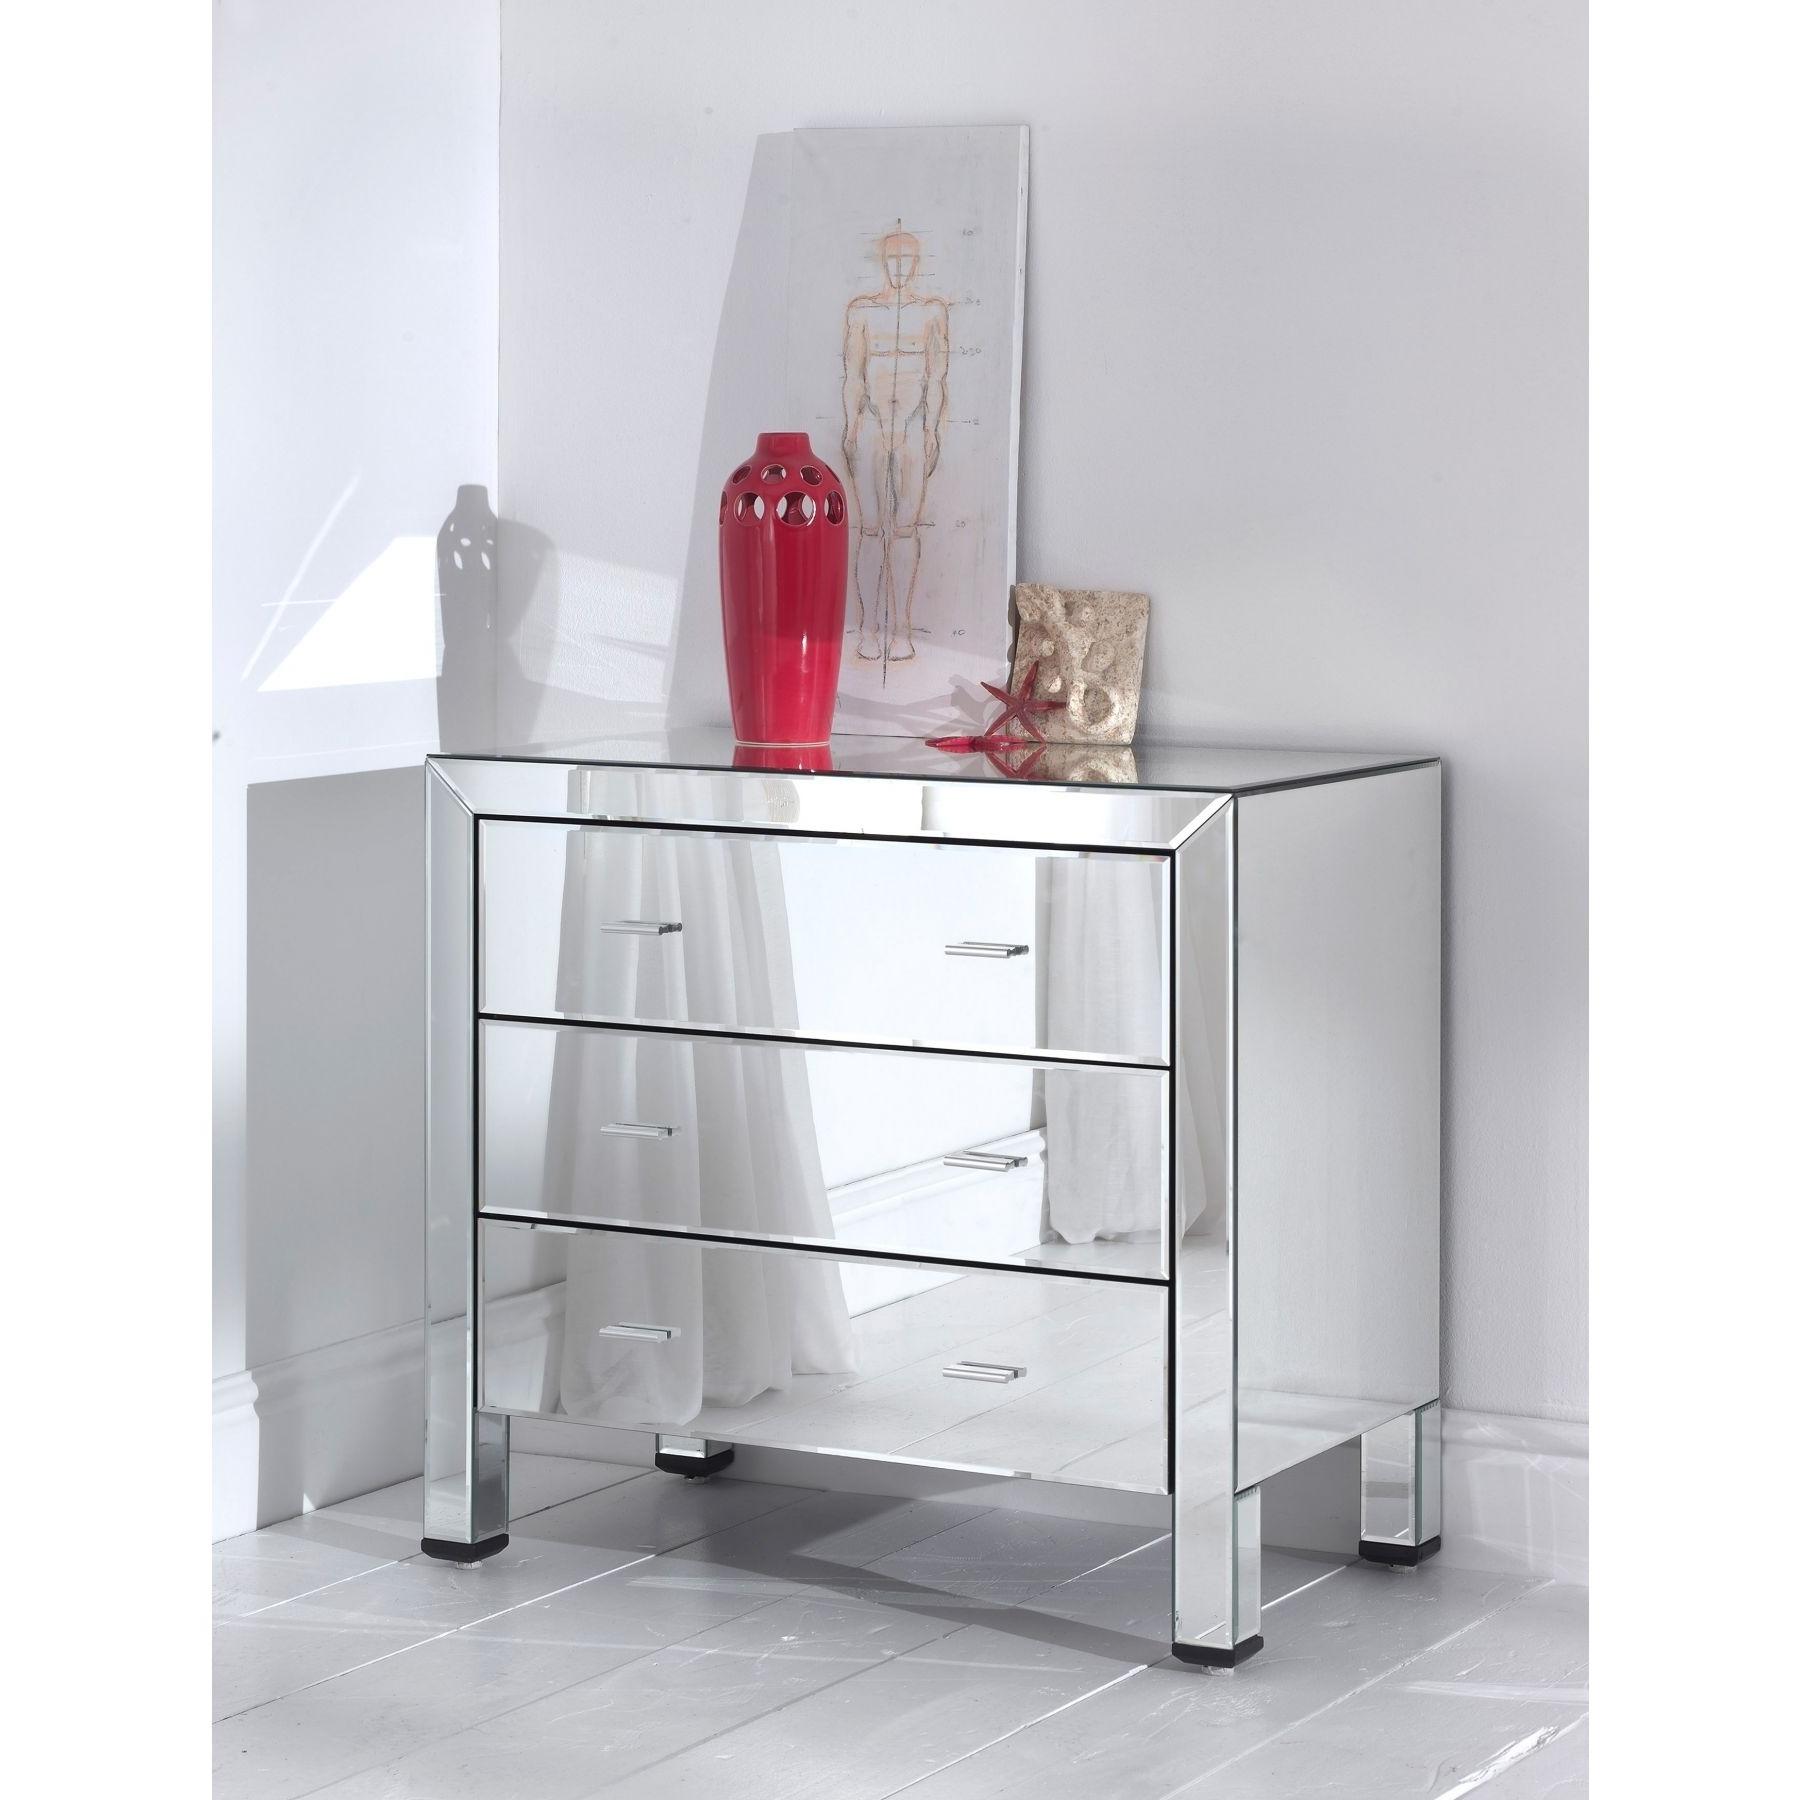 Trendy Mirror Dresser (View 13 of 15)